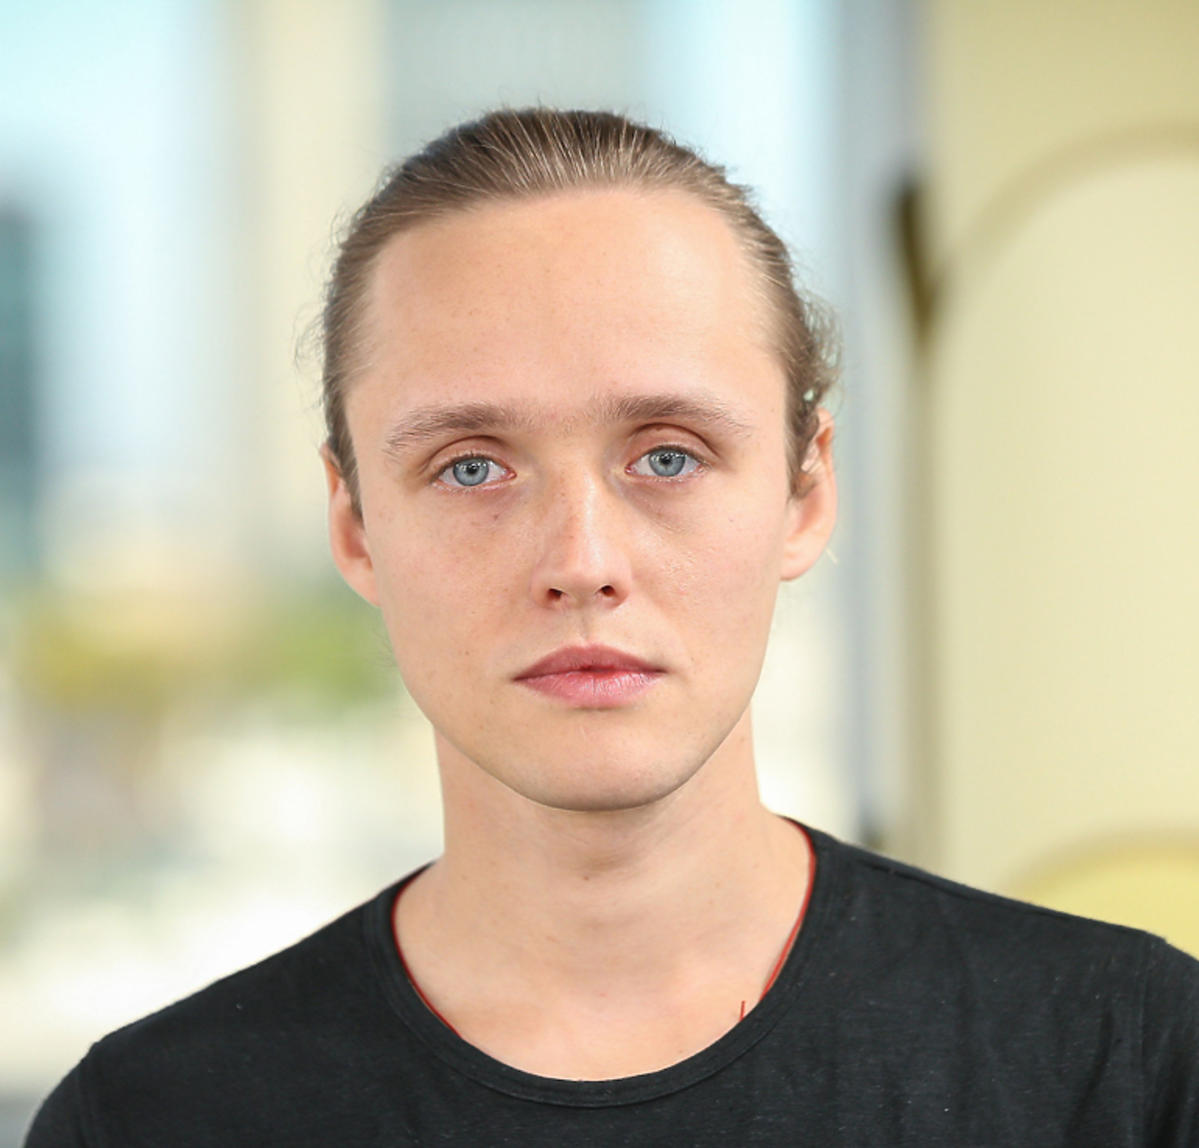 Bartosz Bielenia